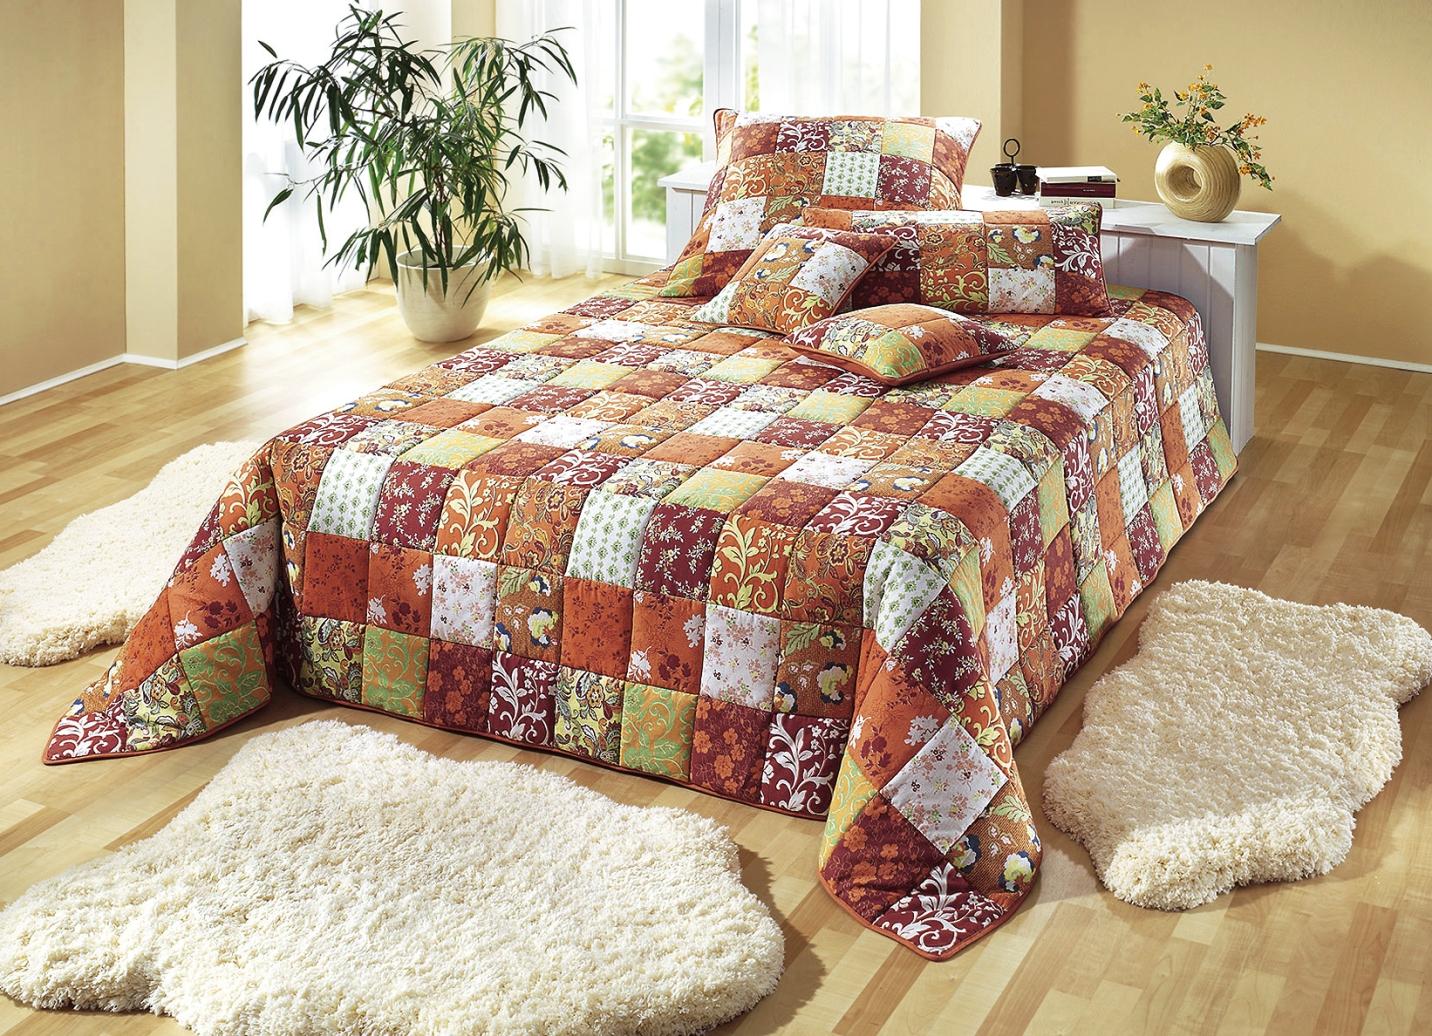 dreams tagesdecke in patchwork optik verschiedene farben tagesdecken bader. Black Bedroom Furniture Sets. Home Design Ideas